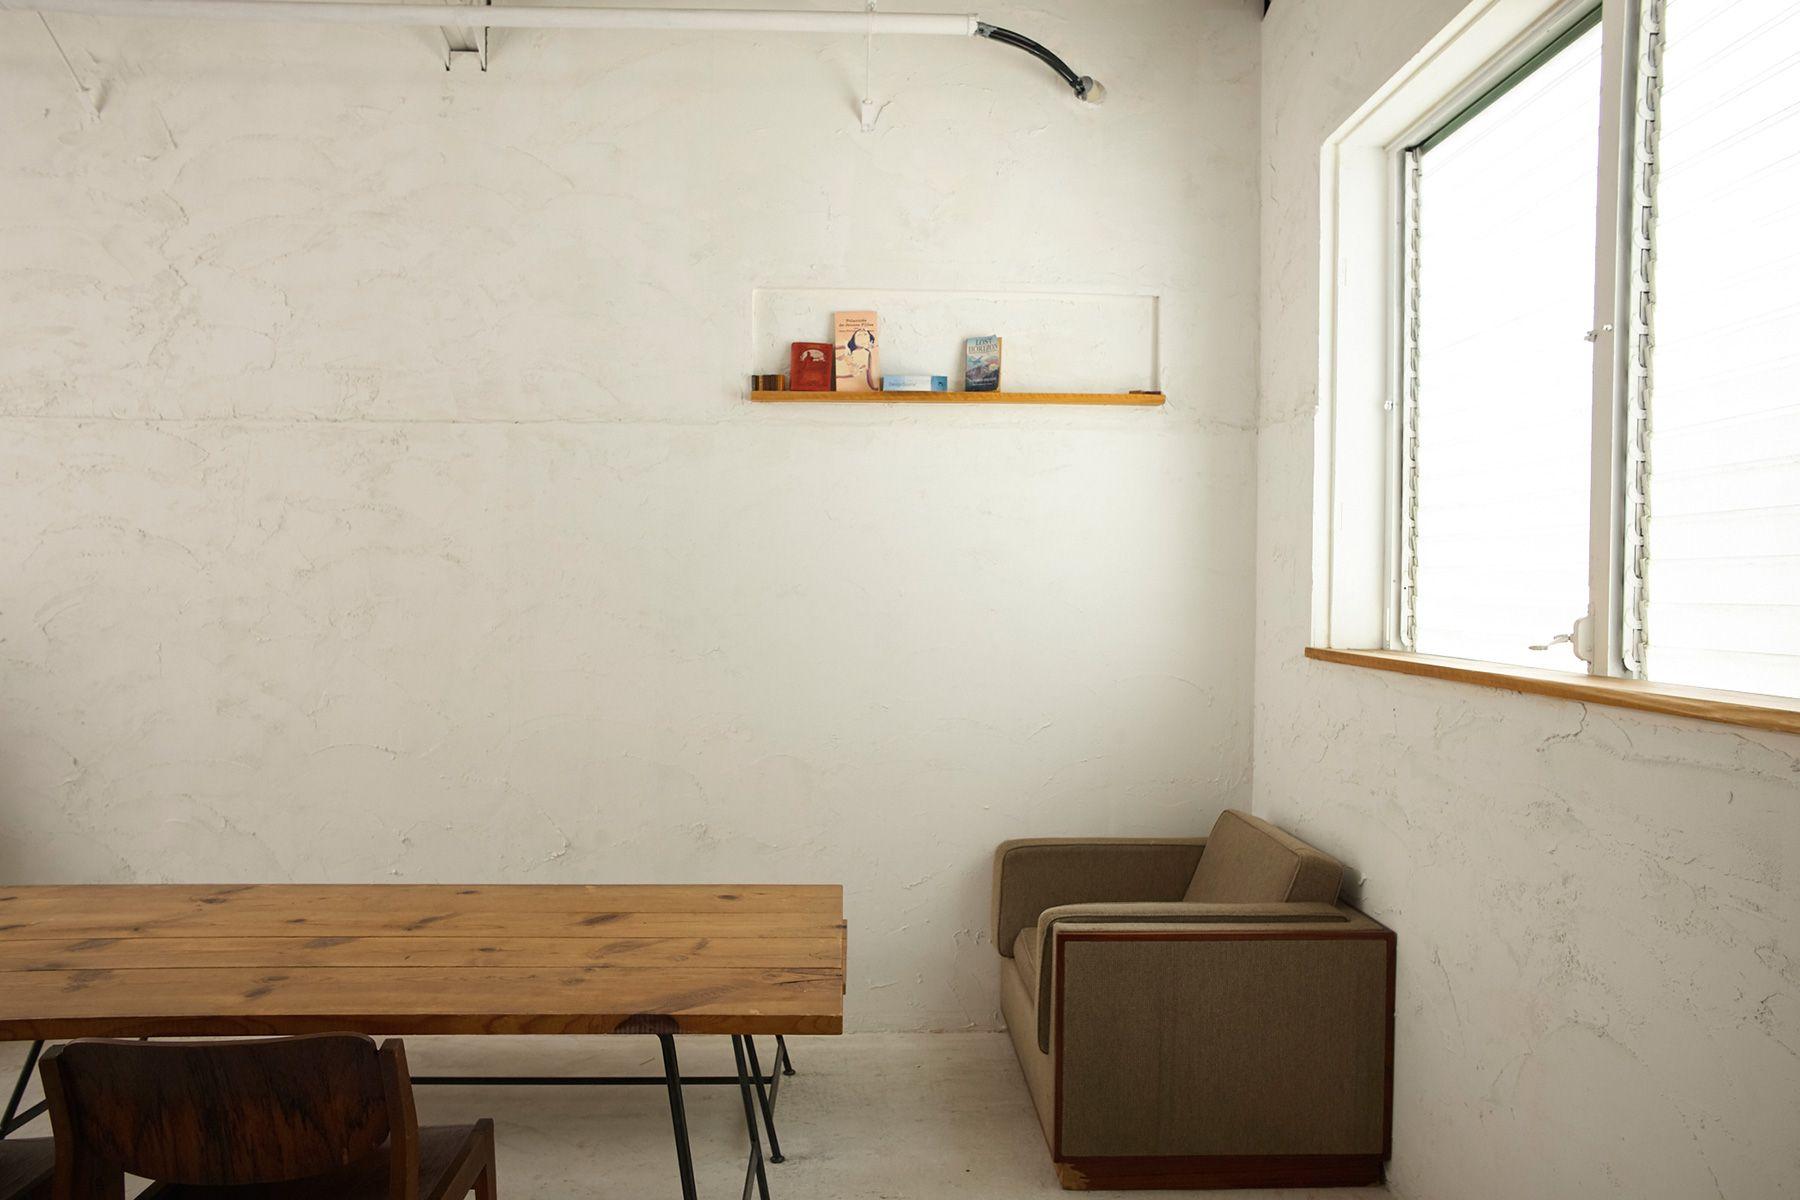 STUDIO MAU(スタジオ マウ)ニュアンスのある白壁